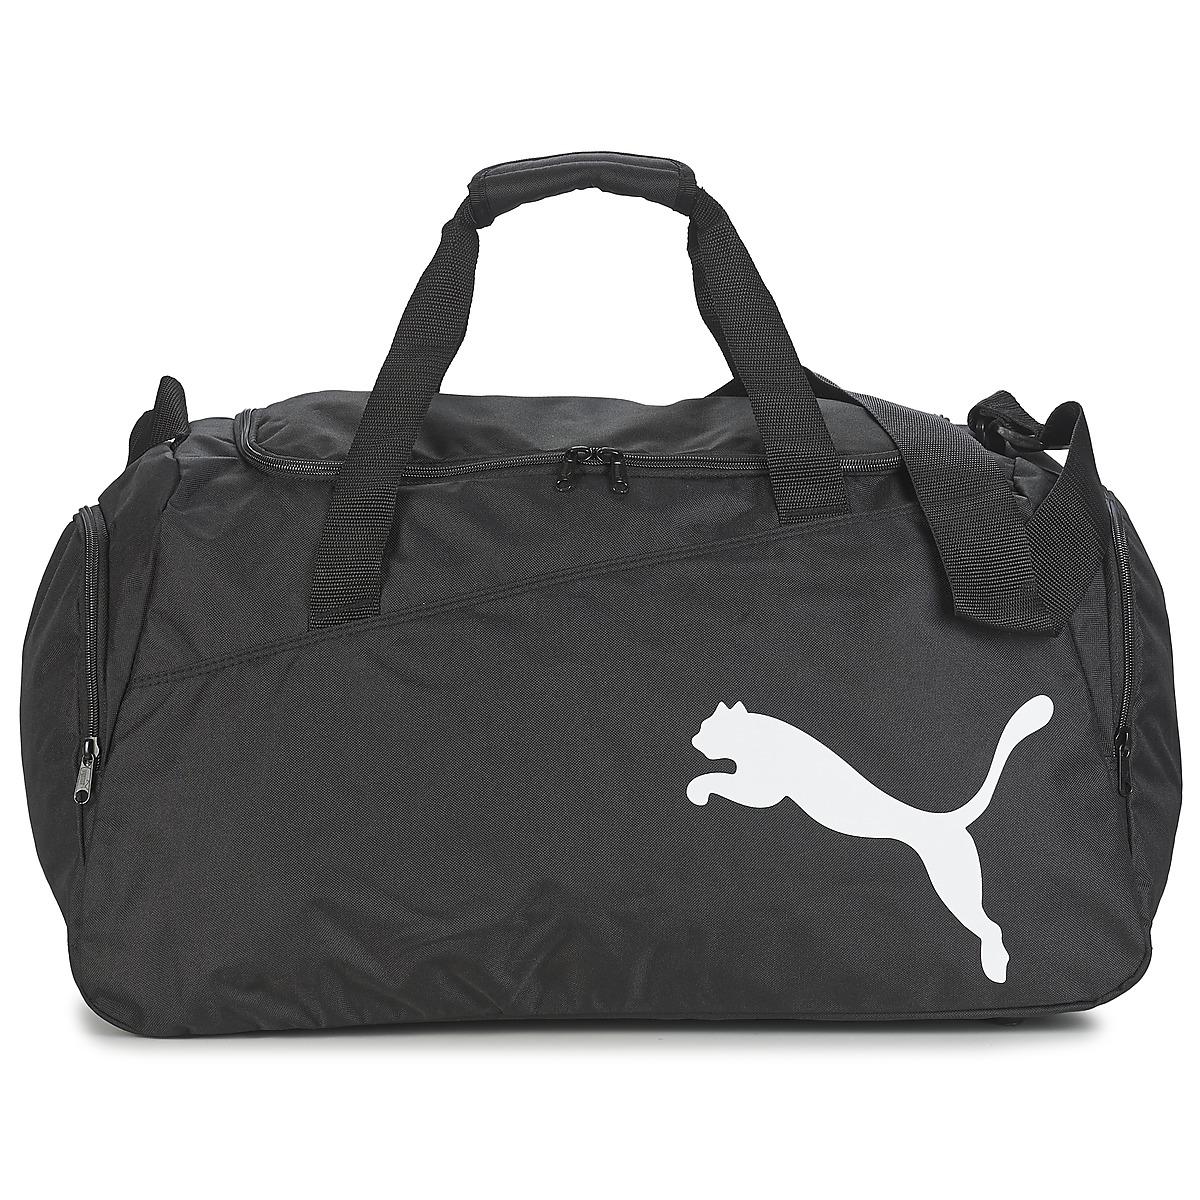 Puma PRO TRAINING MEDIUM BAG Noir